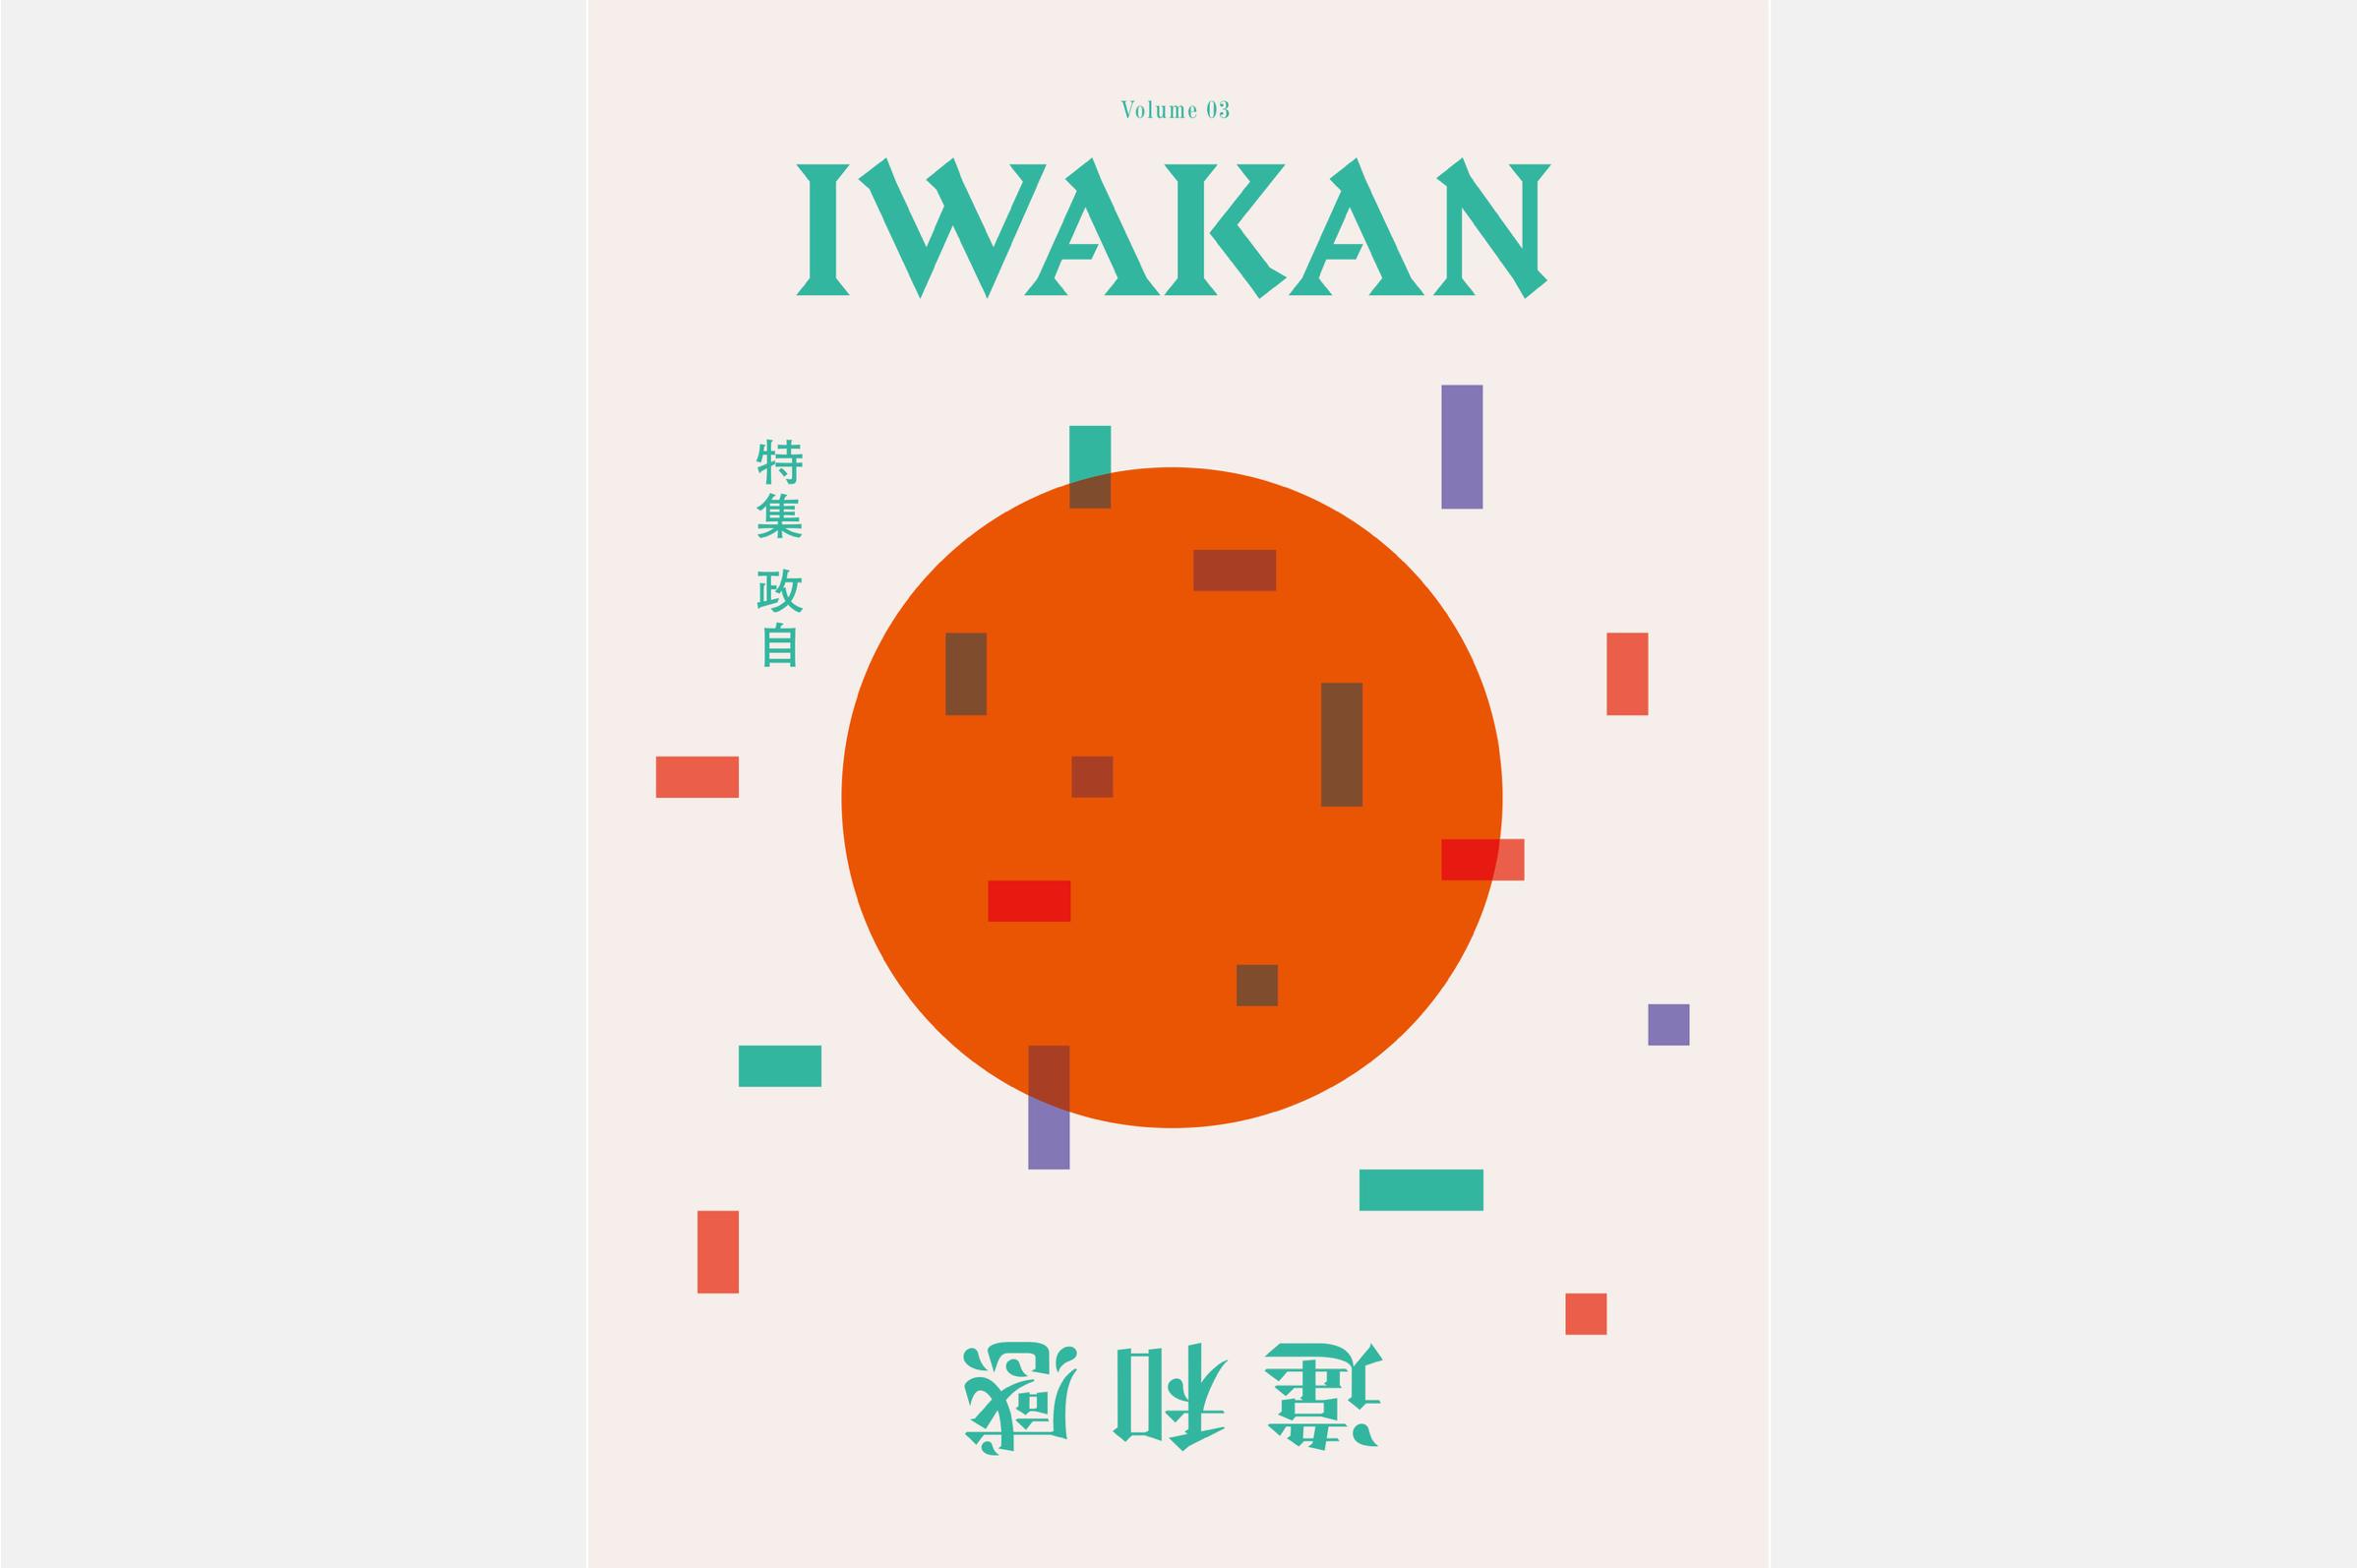 【IWAKAN】 Volume 03 特集 政自